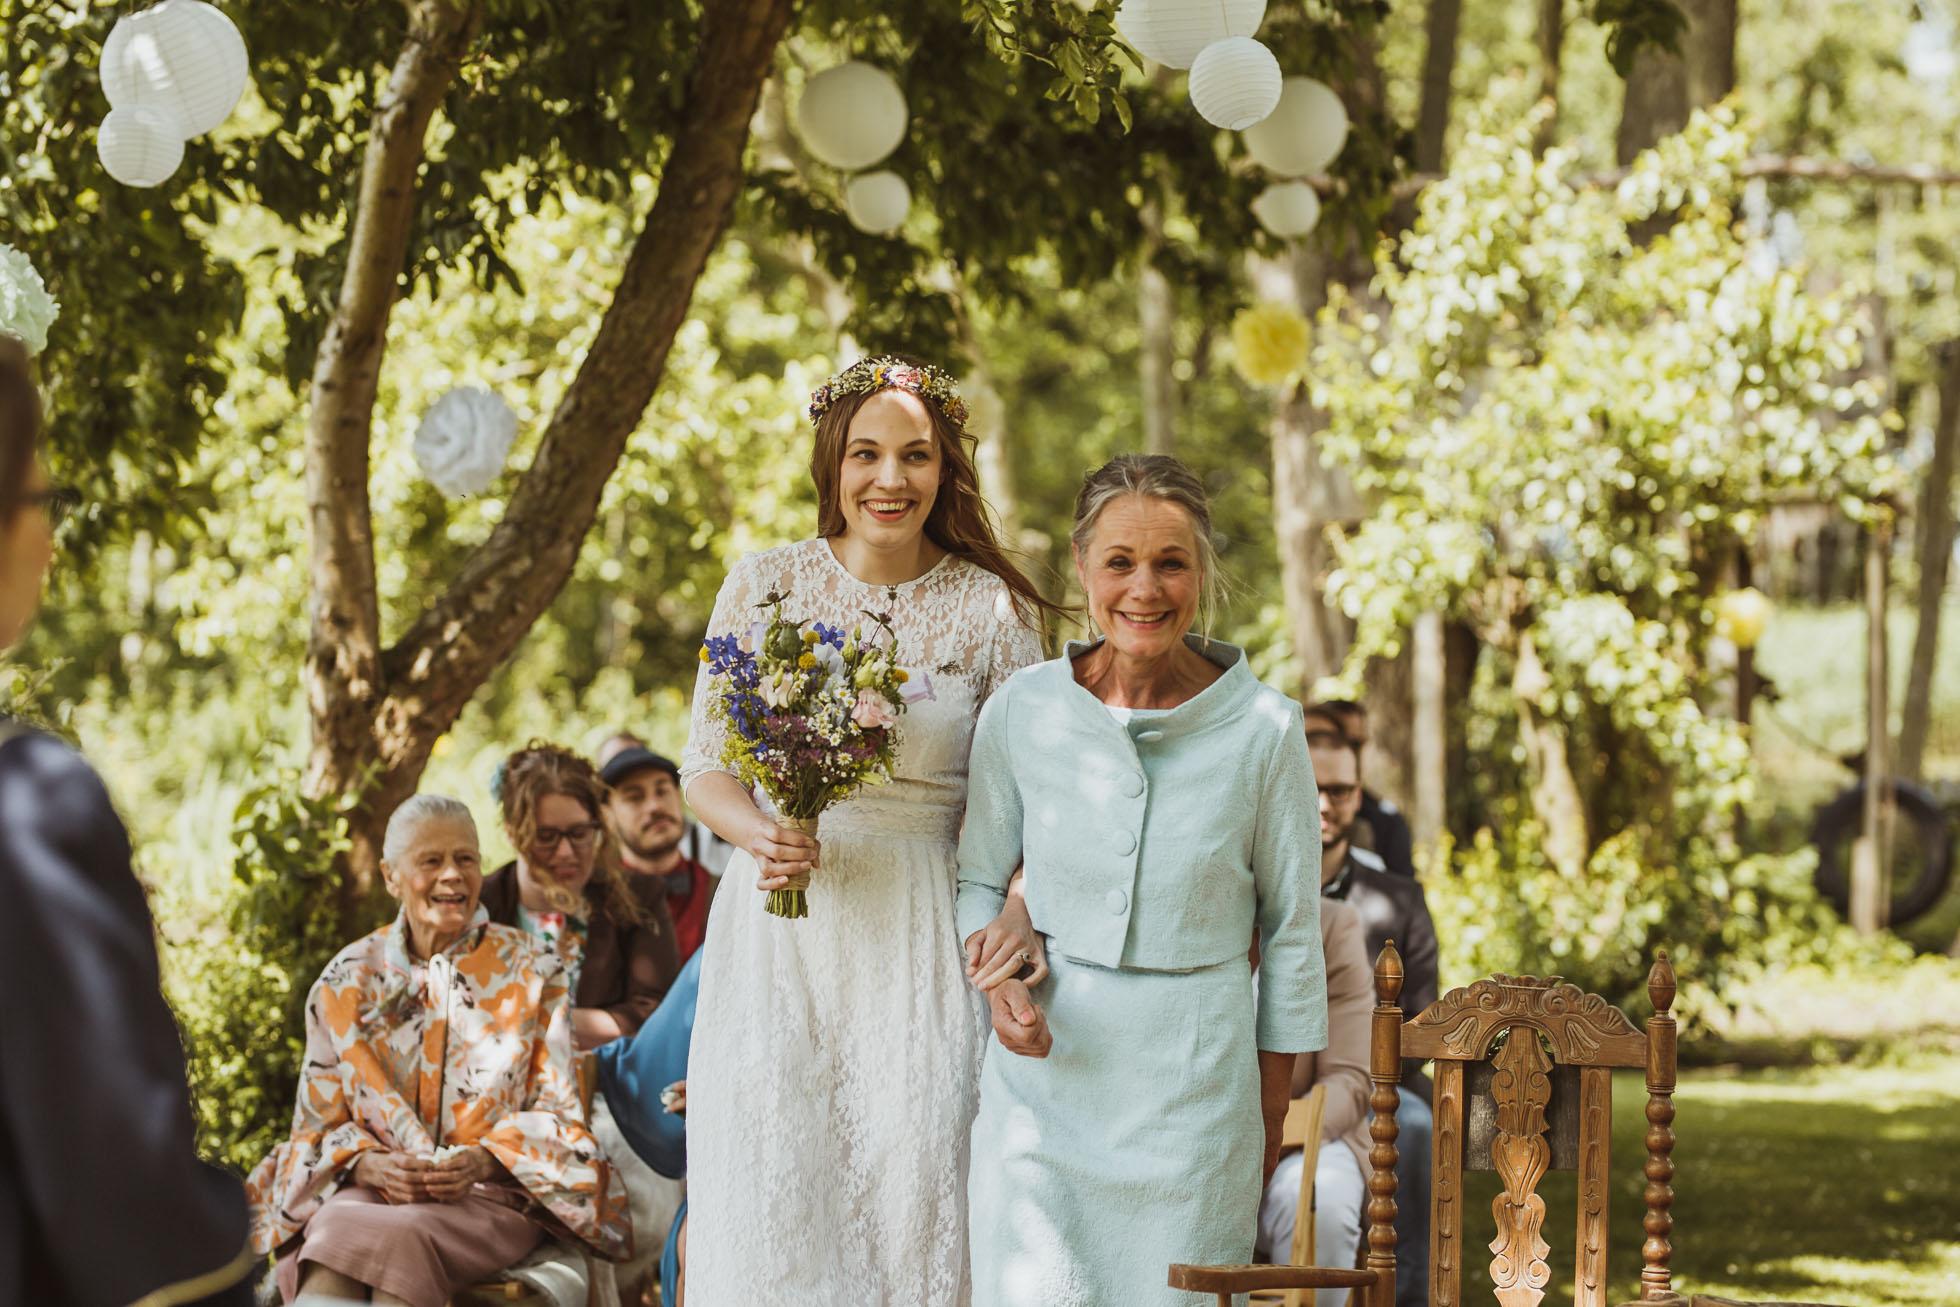 utrecht-wedding-photographer-66.jpg